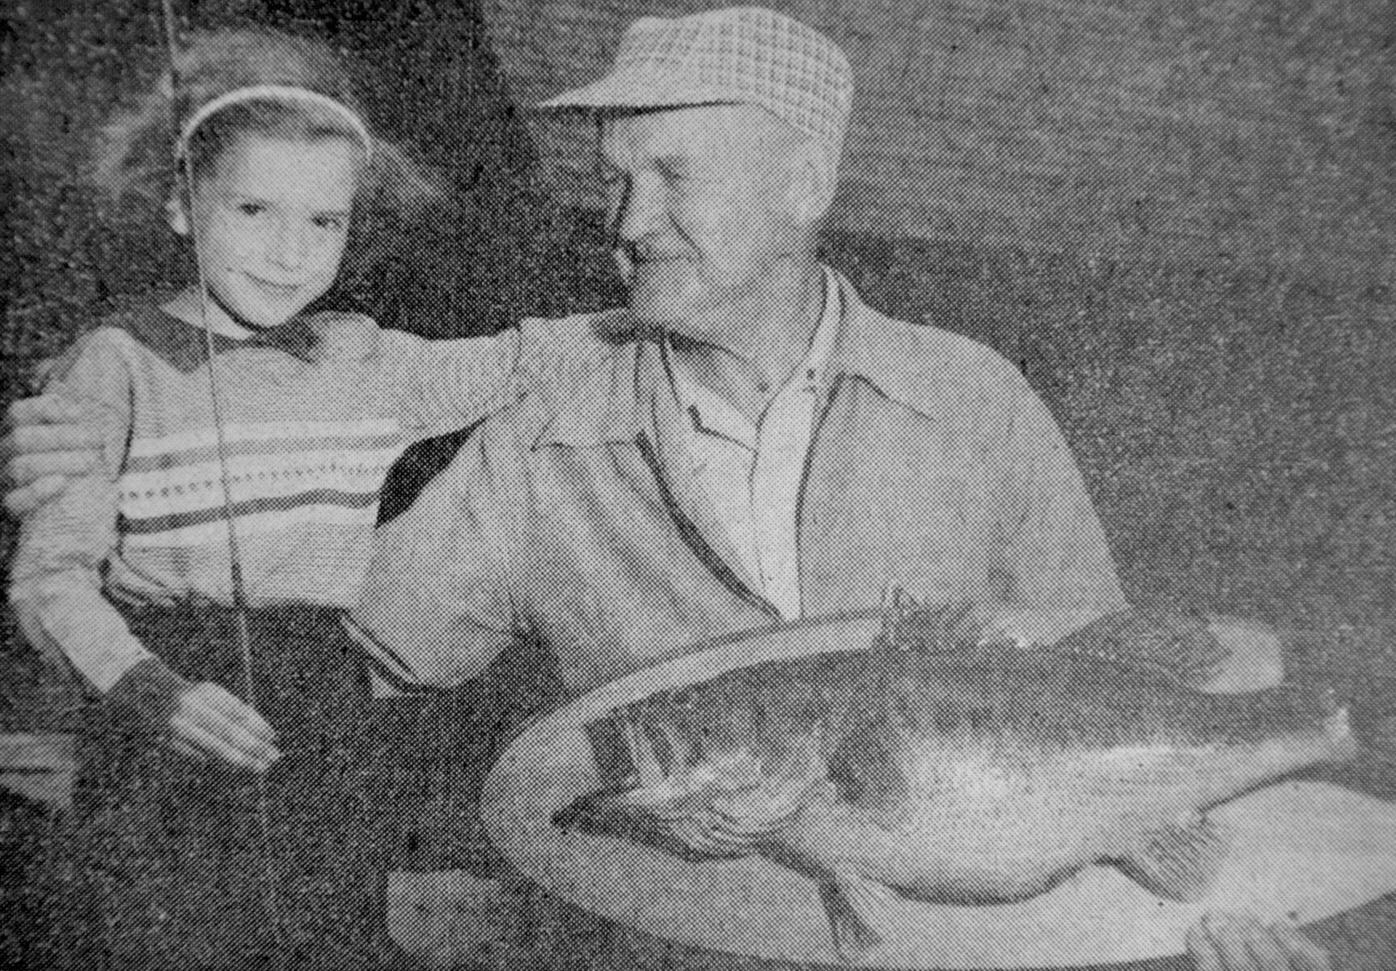 Walter Keys, Lyn Williams